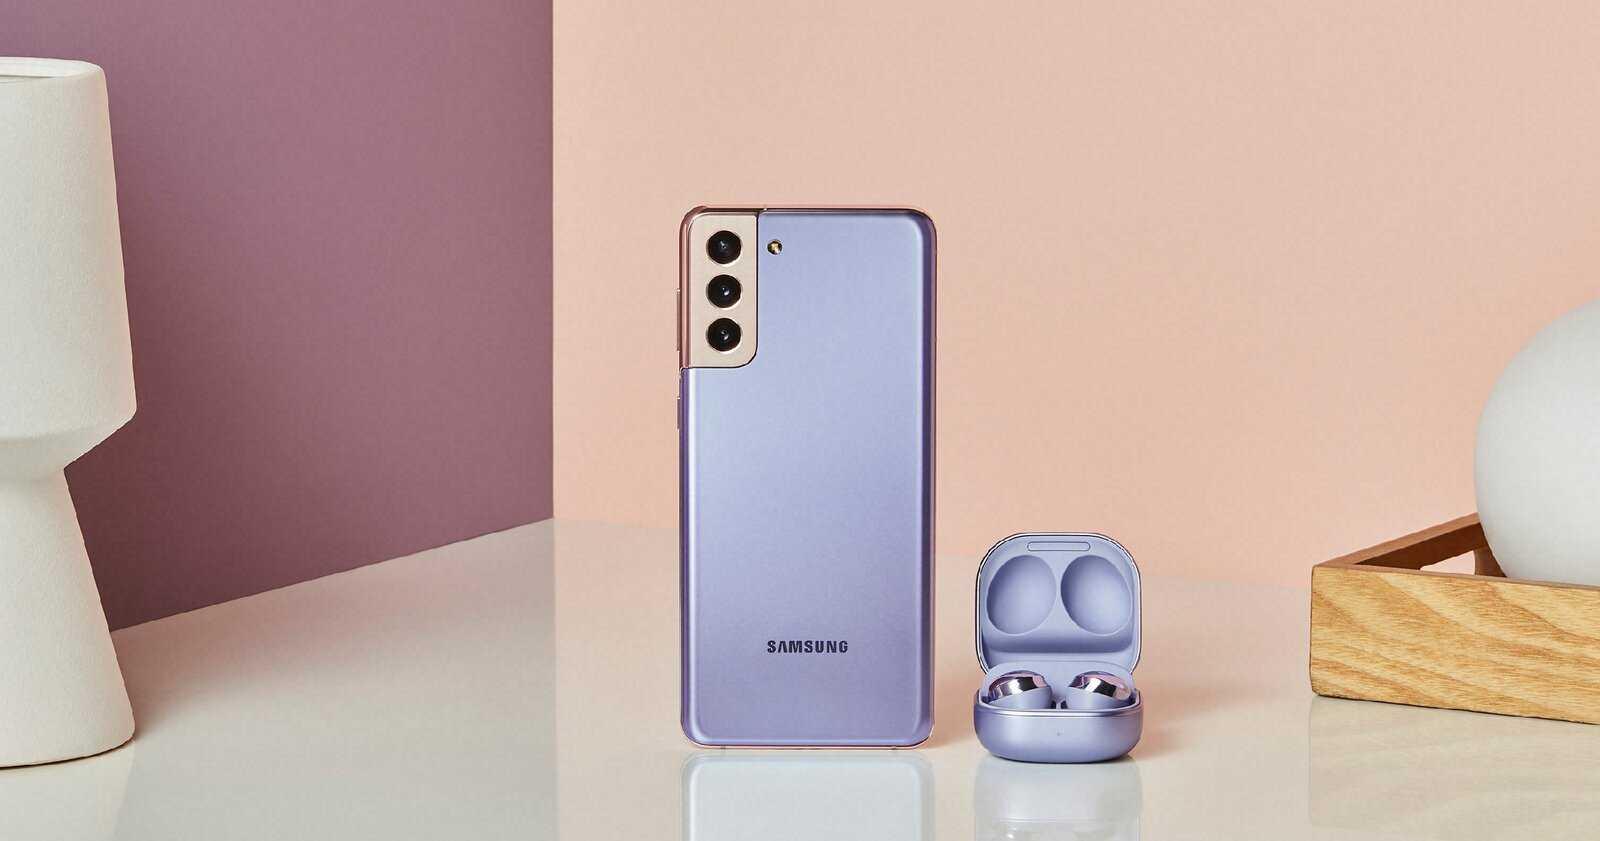 Samsung Galaxy S21 Plus avec Buds Pro